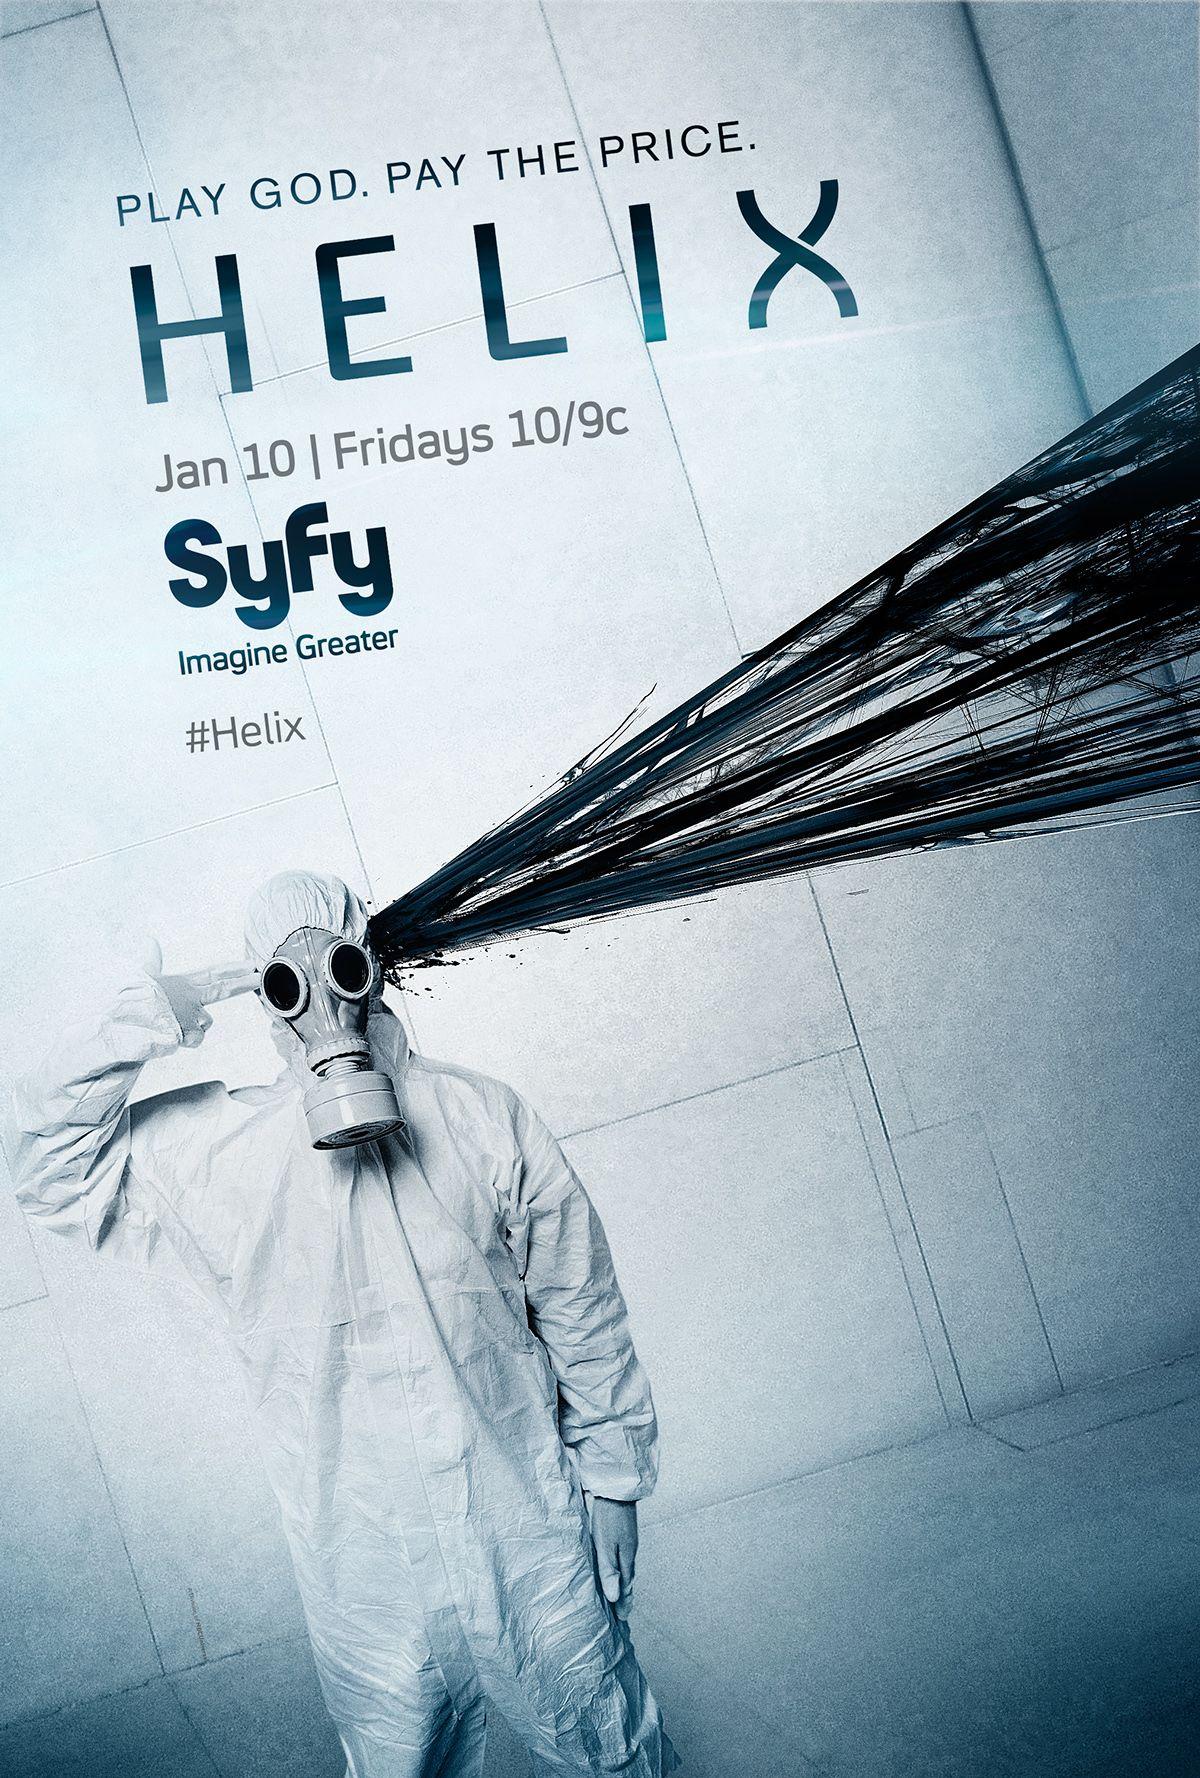 SYFY HELIX on Behance | Syfy love in 2019 | Shannara